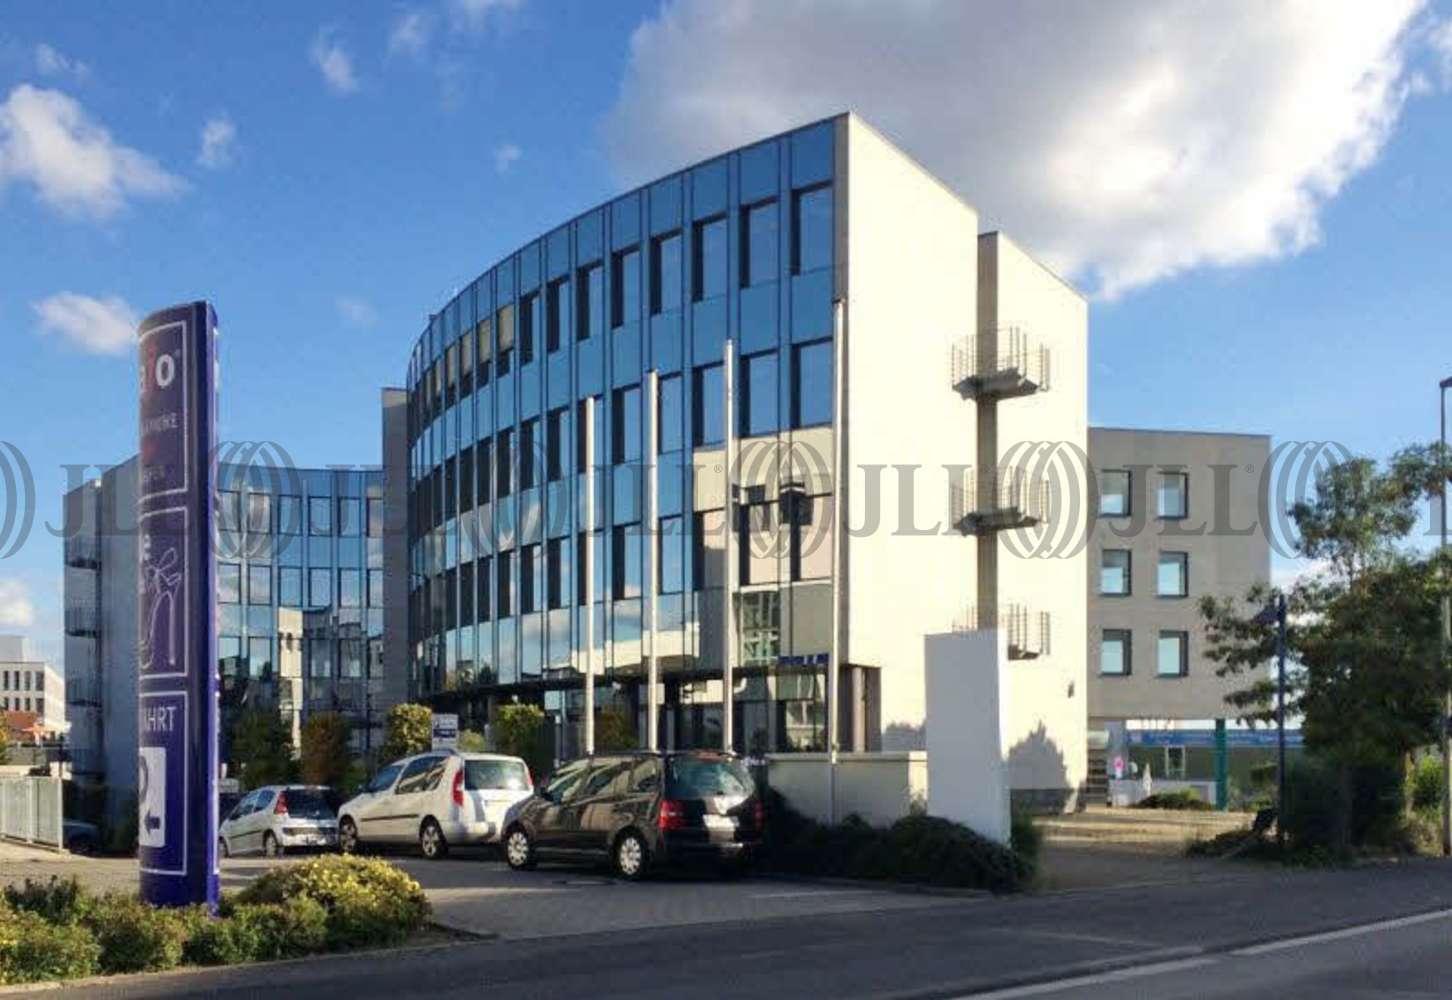 Büros Oberursel (taunus), 61440 - Büro - Oberursel (Taunus), Stierstadt - F1529 - 9419208